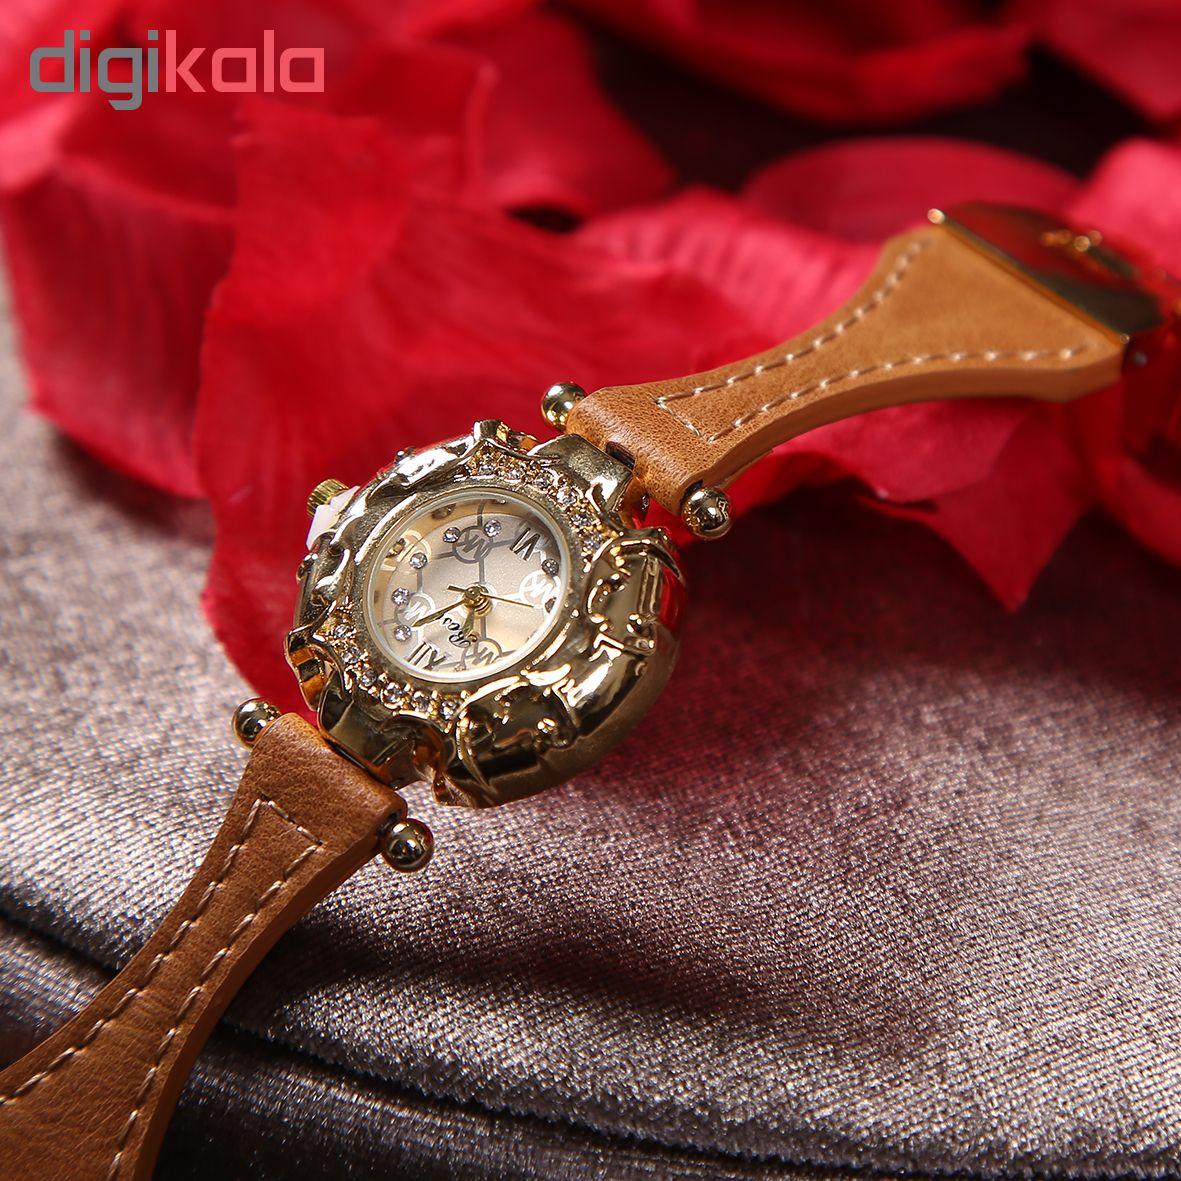 ساعت زنانه برند رست کد 339